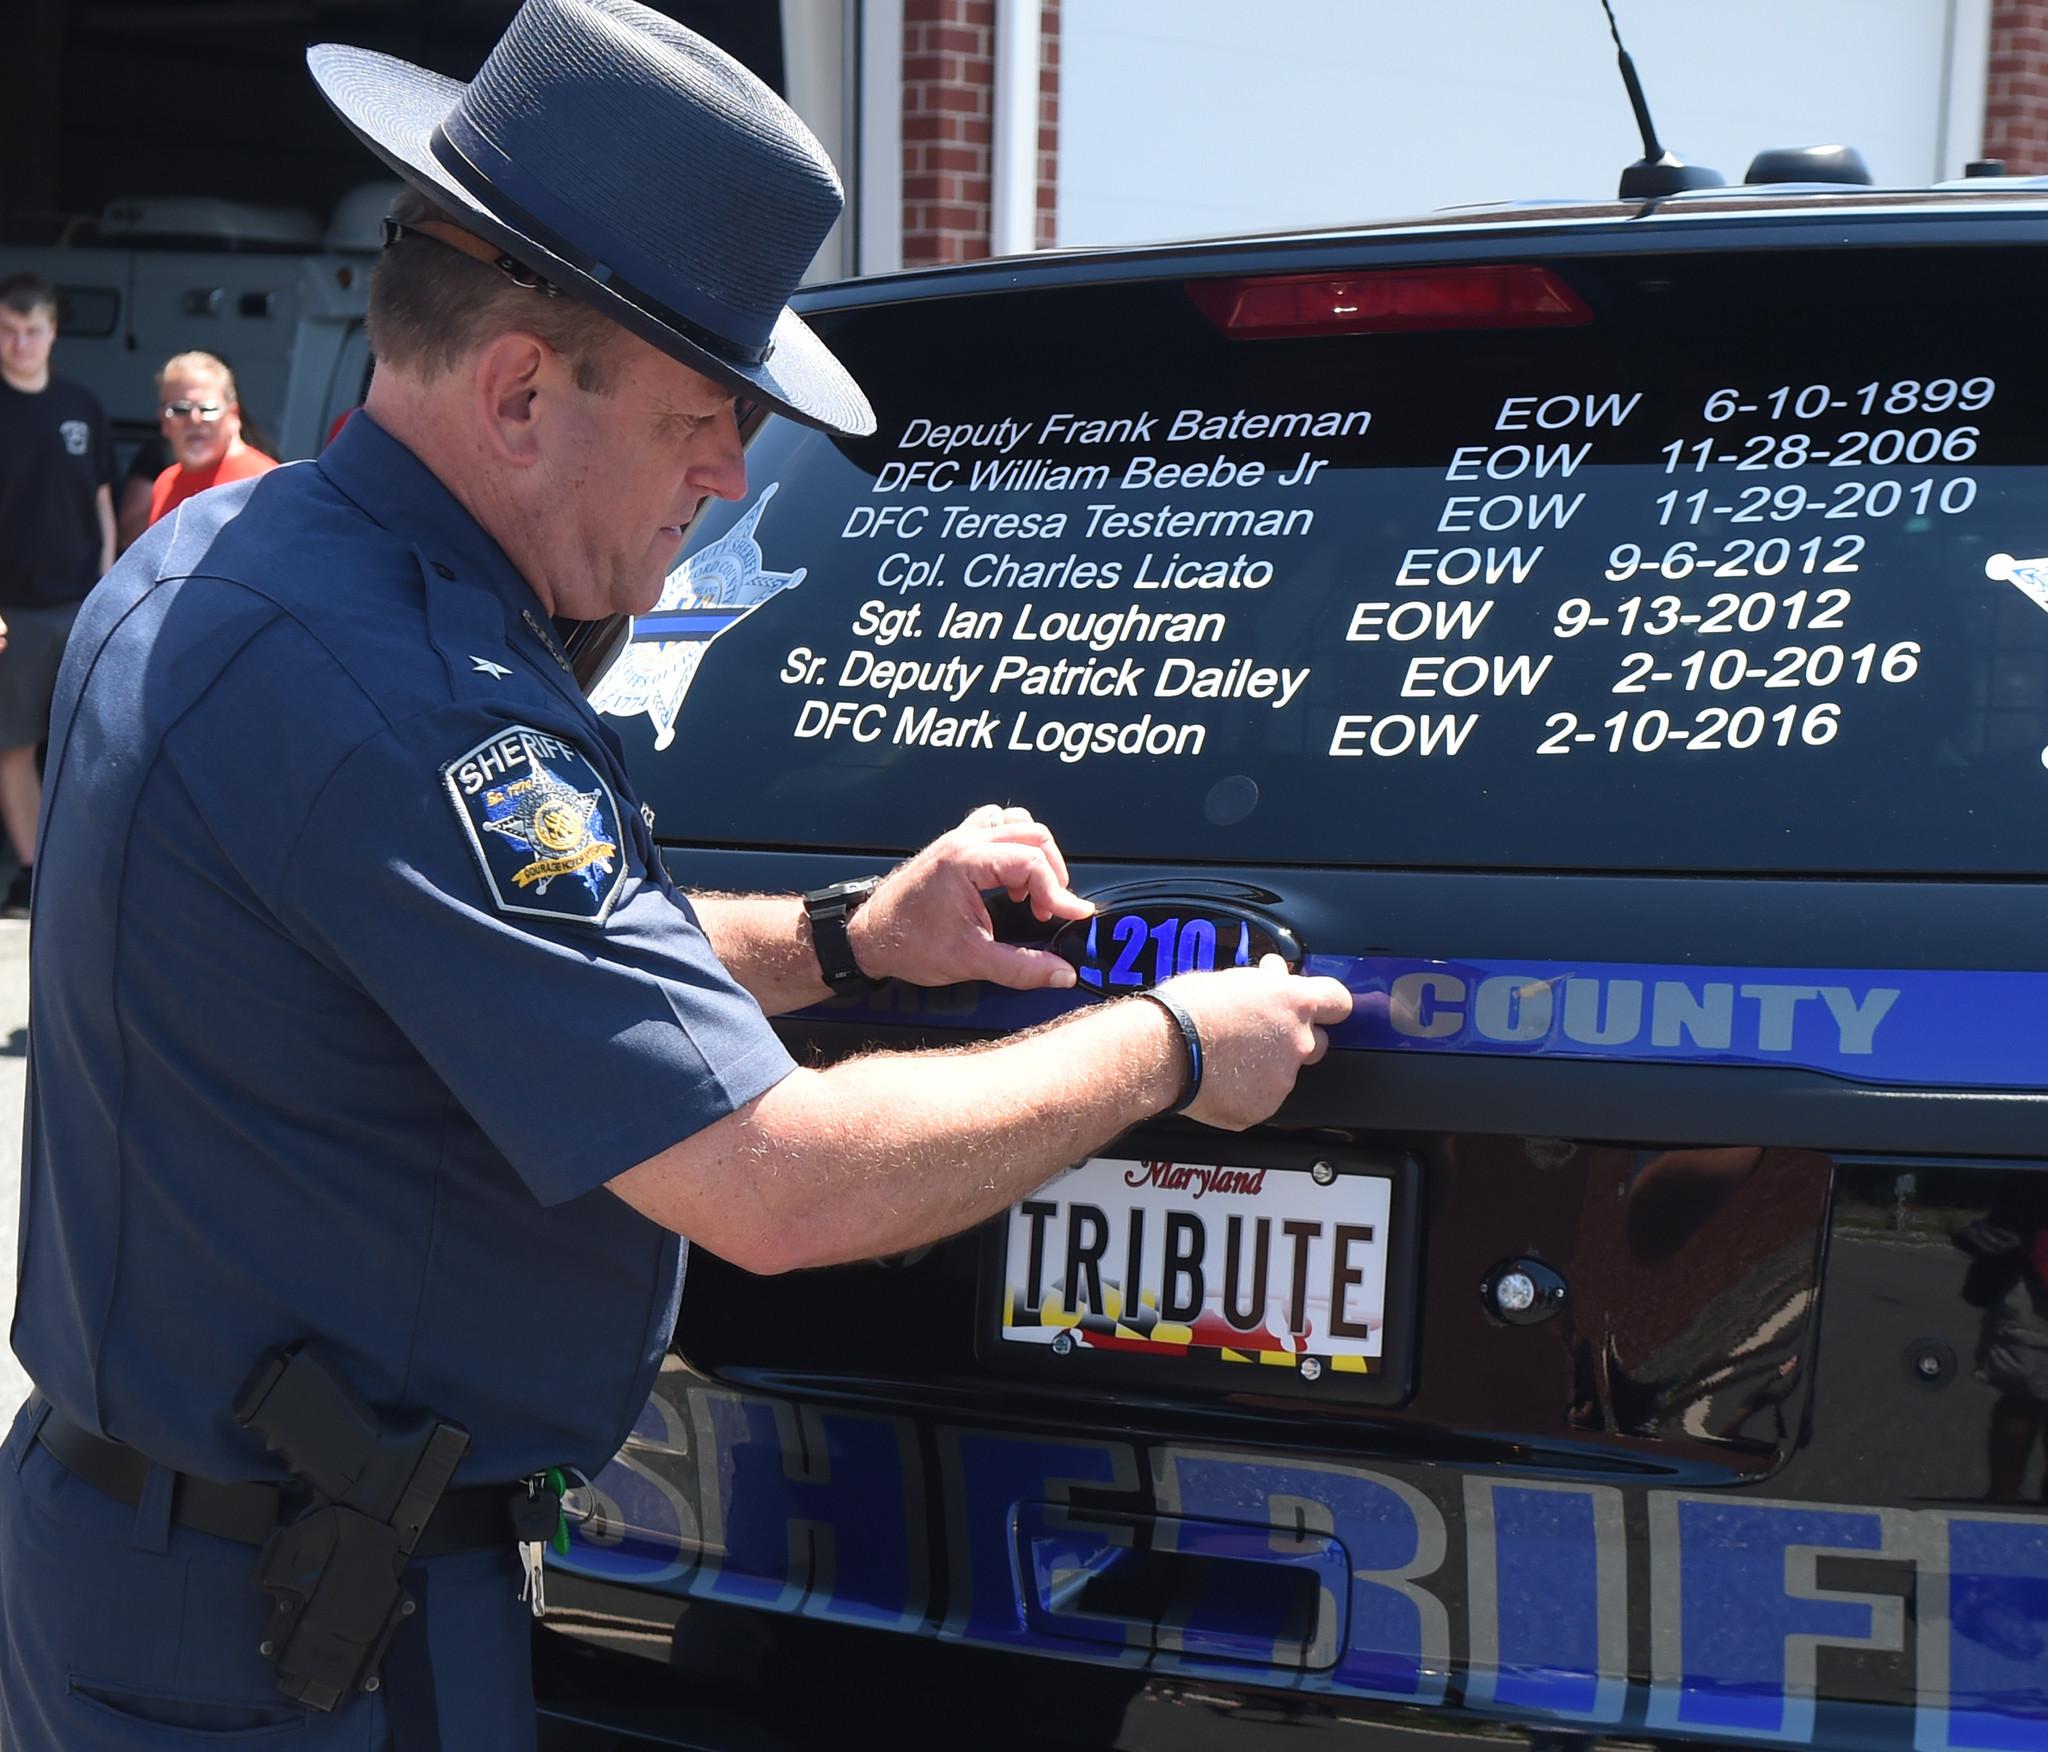 U0027Tributeu0027 Vehicle Honoring Fallen Harford Deputies Is Unveiled By Sheriffu0027s  Office   The Aegis